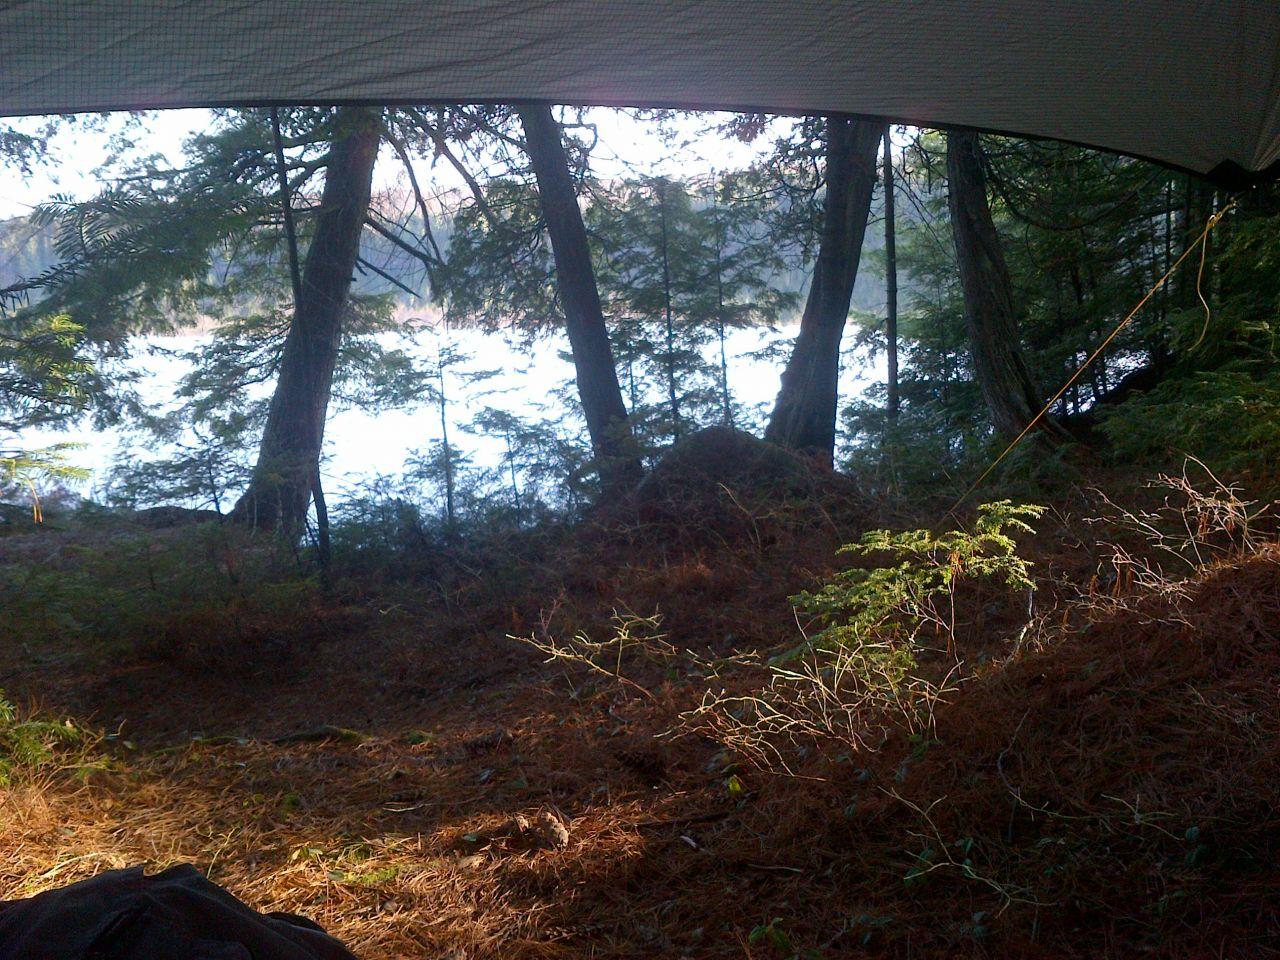 Canoe Trip To Mcintosh Lake, Algonquin Provincial Park